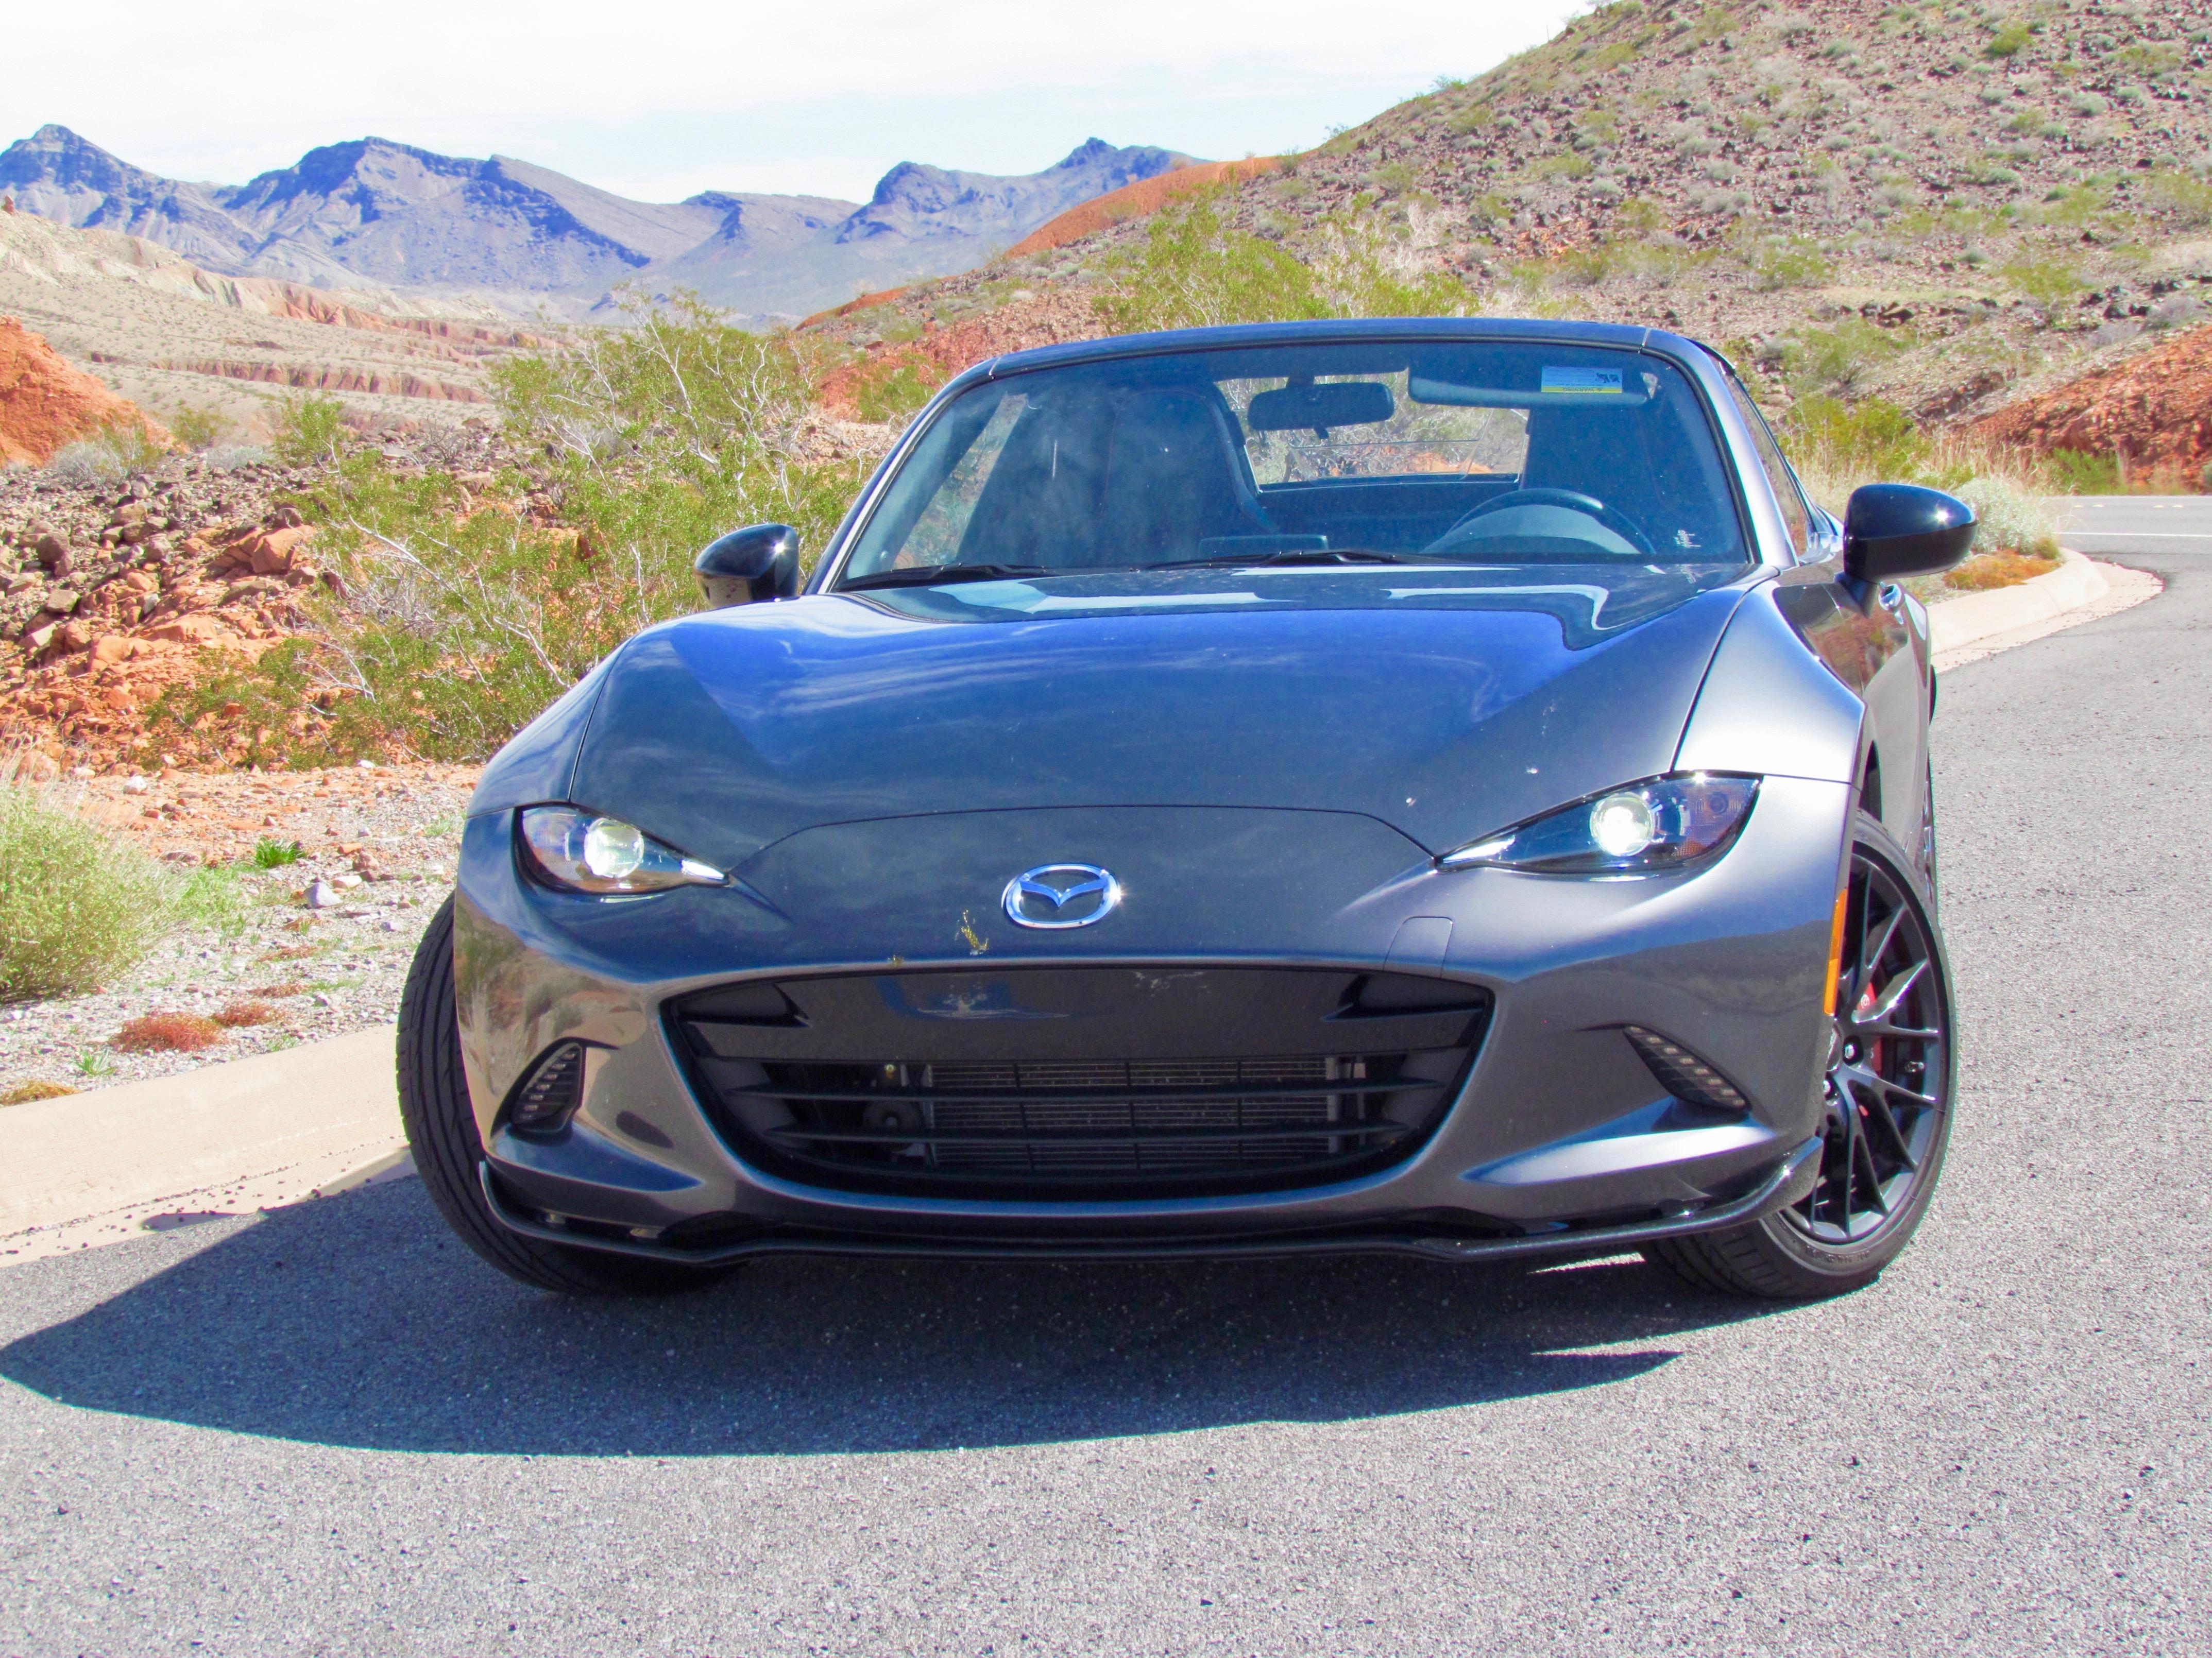 2019 Mazda Miata, 2019 Mazda MX-5 RF proves horsepower is overrated, ClassicCars.com Journal